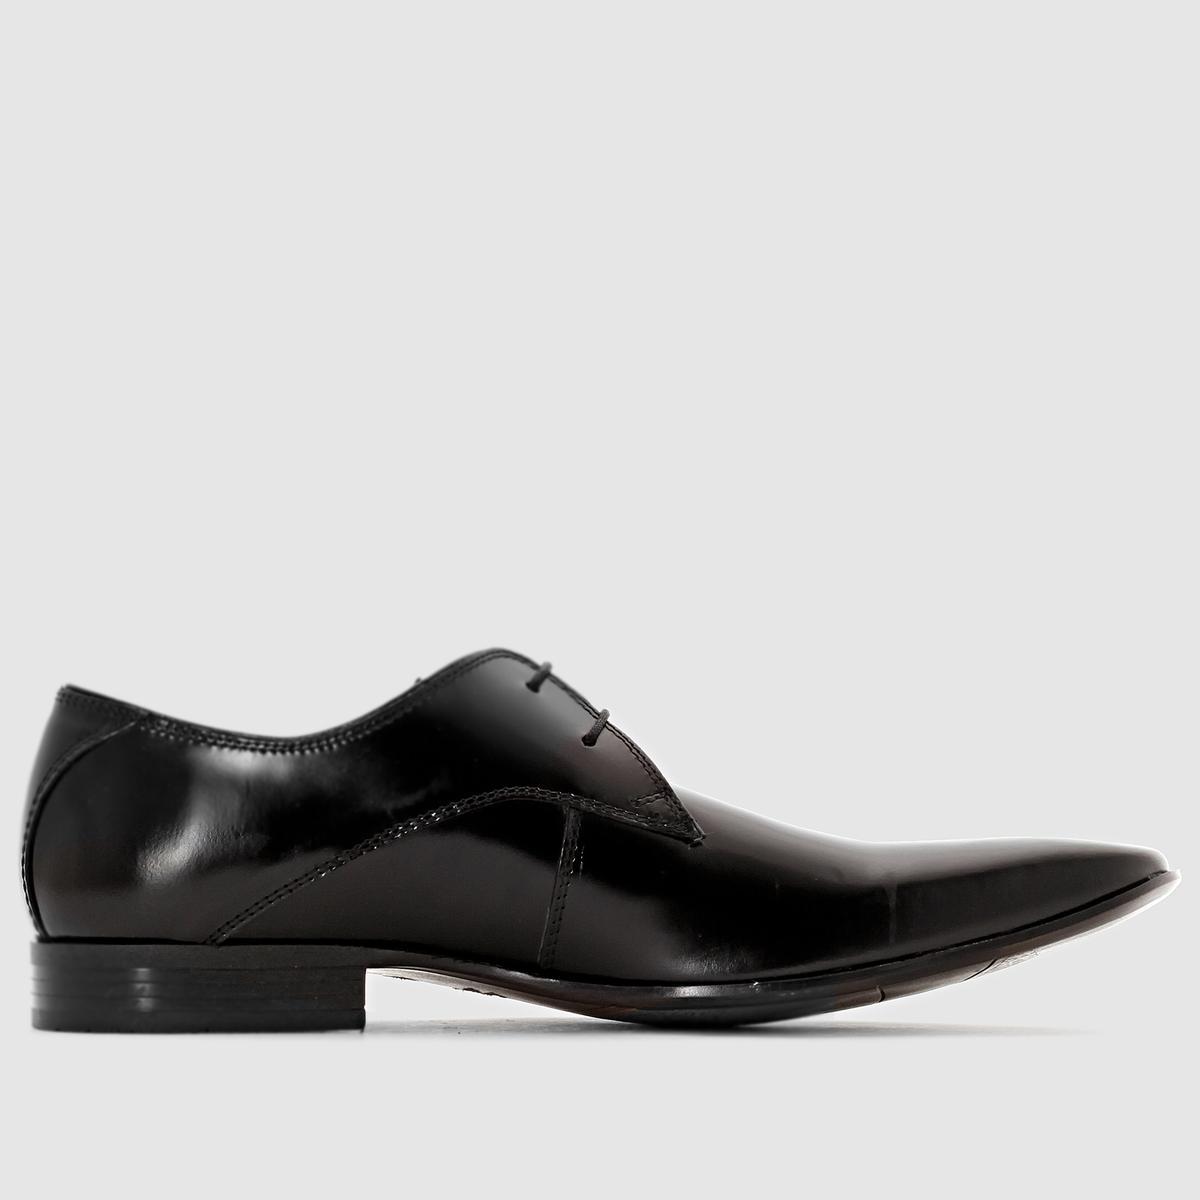 Ботинки-дерби ботинки дерби clarks stafford park5